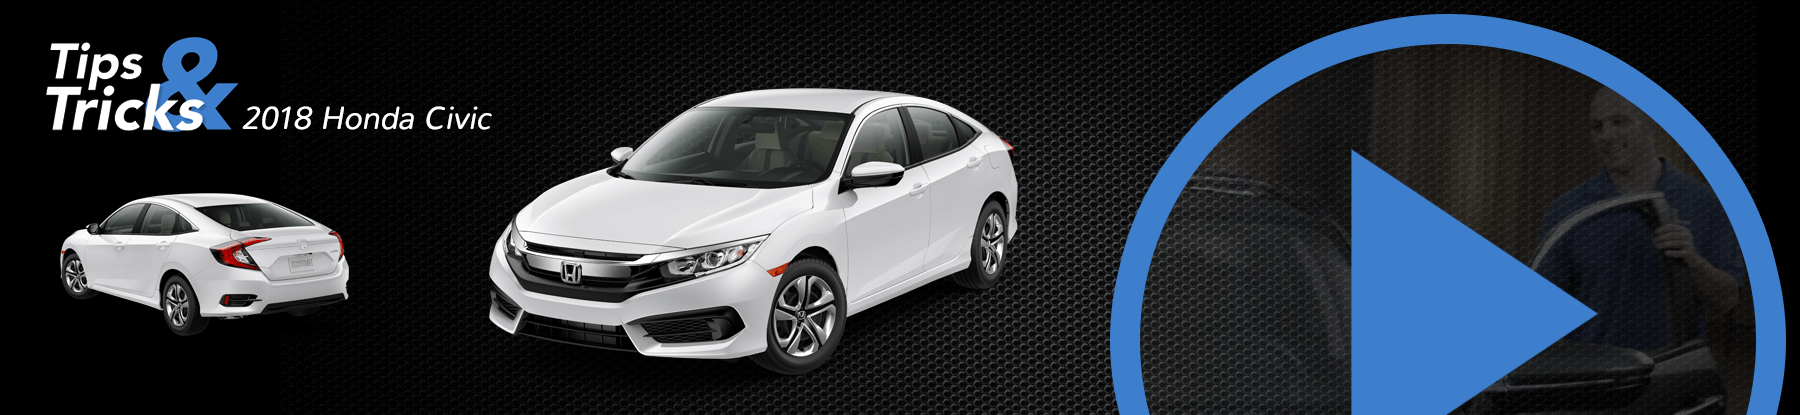 Honda Civic Tips and Tricks Banner